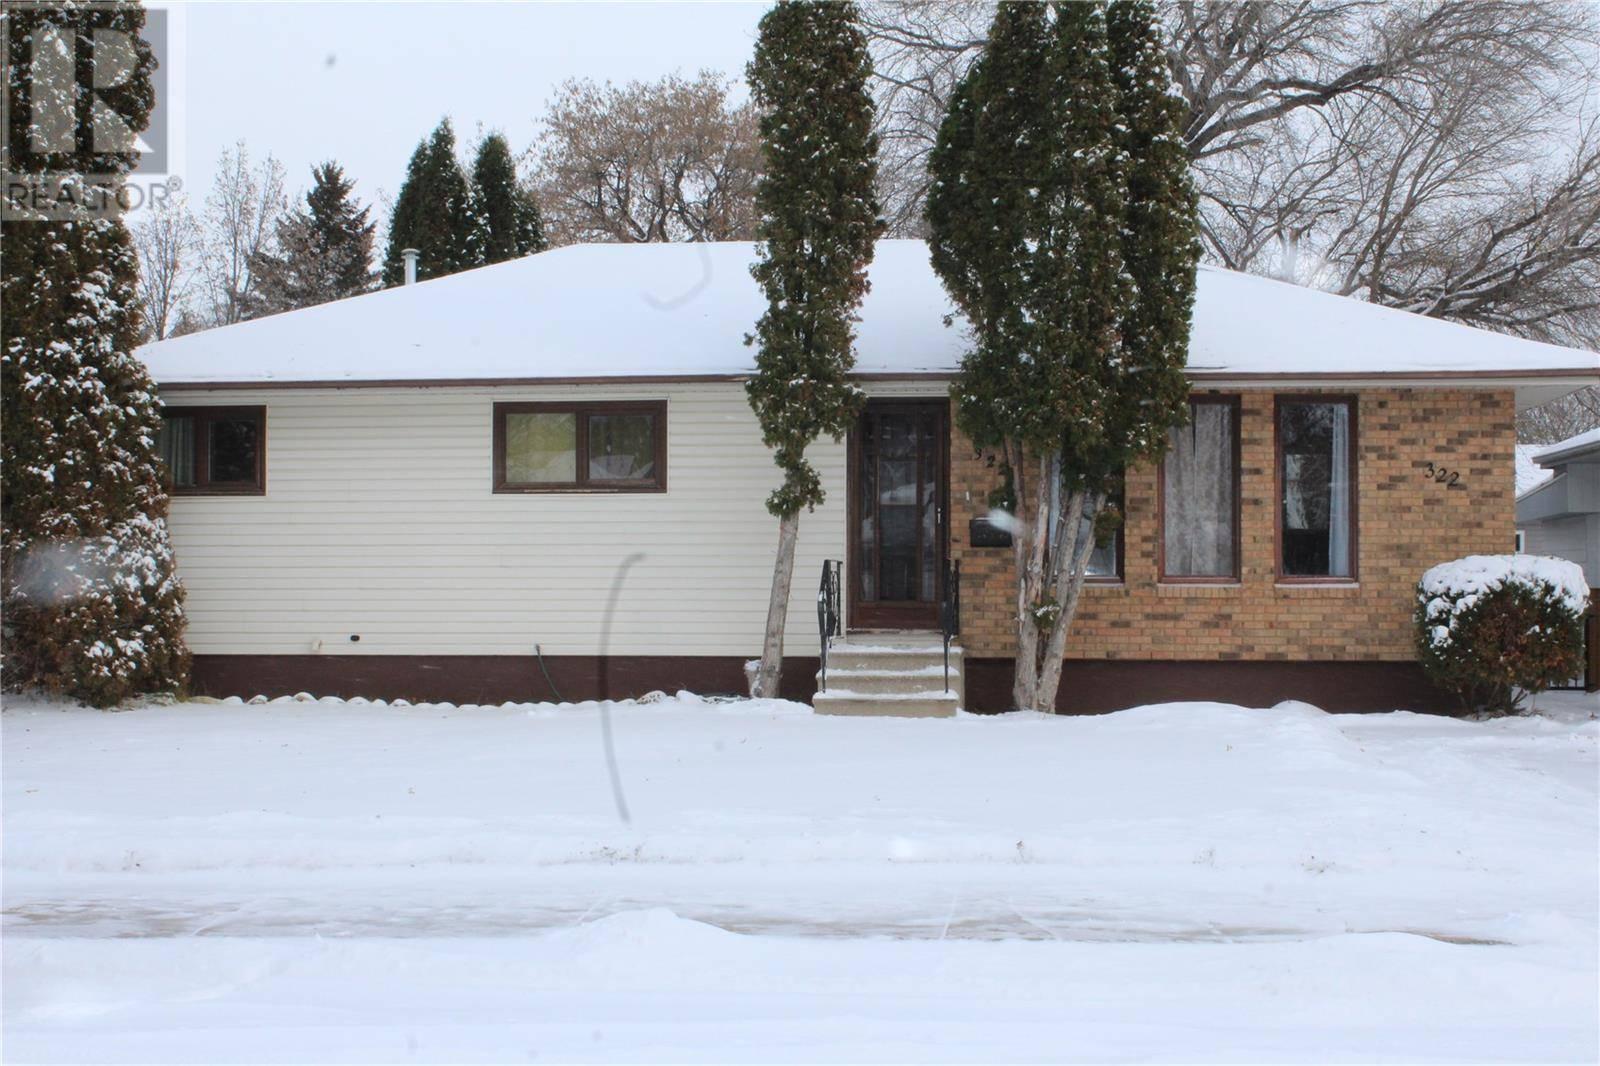 House for sale at 322 V Ave N Saskatoon Saskatchewan - MLS: SK790647